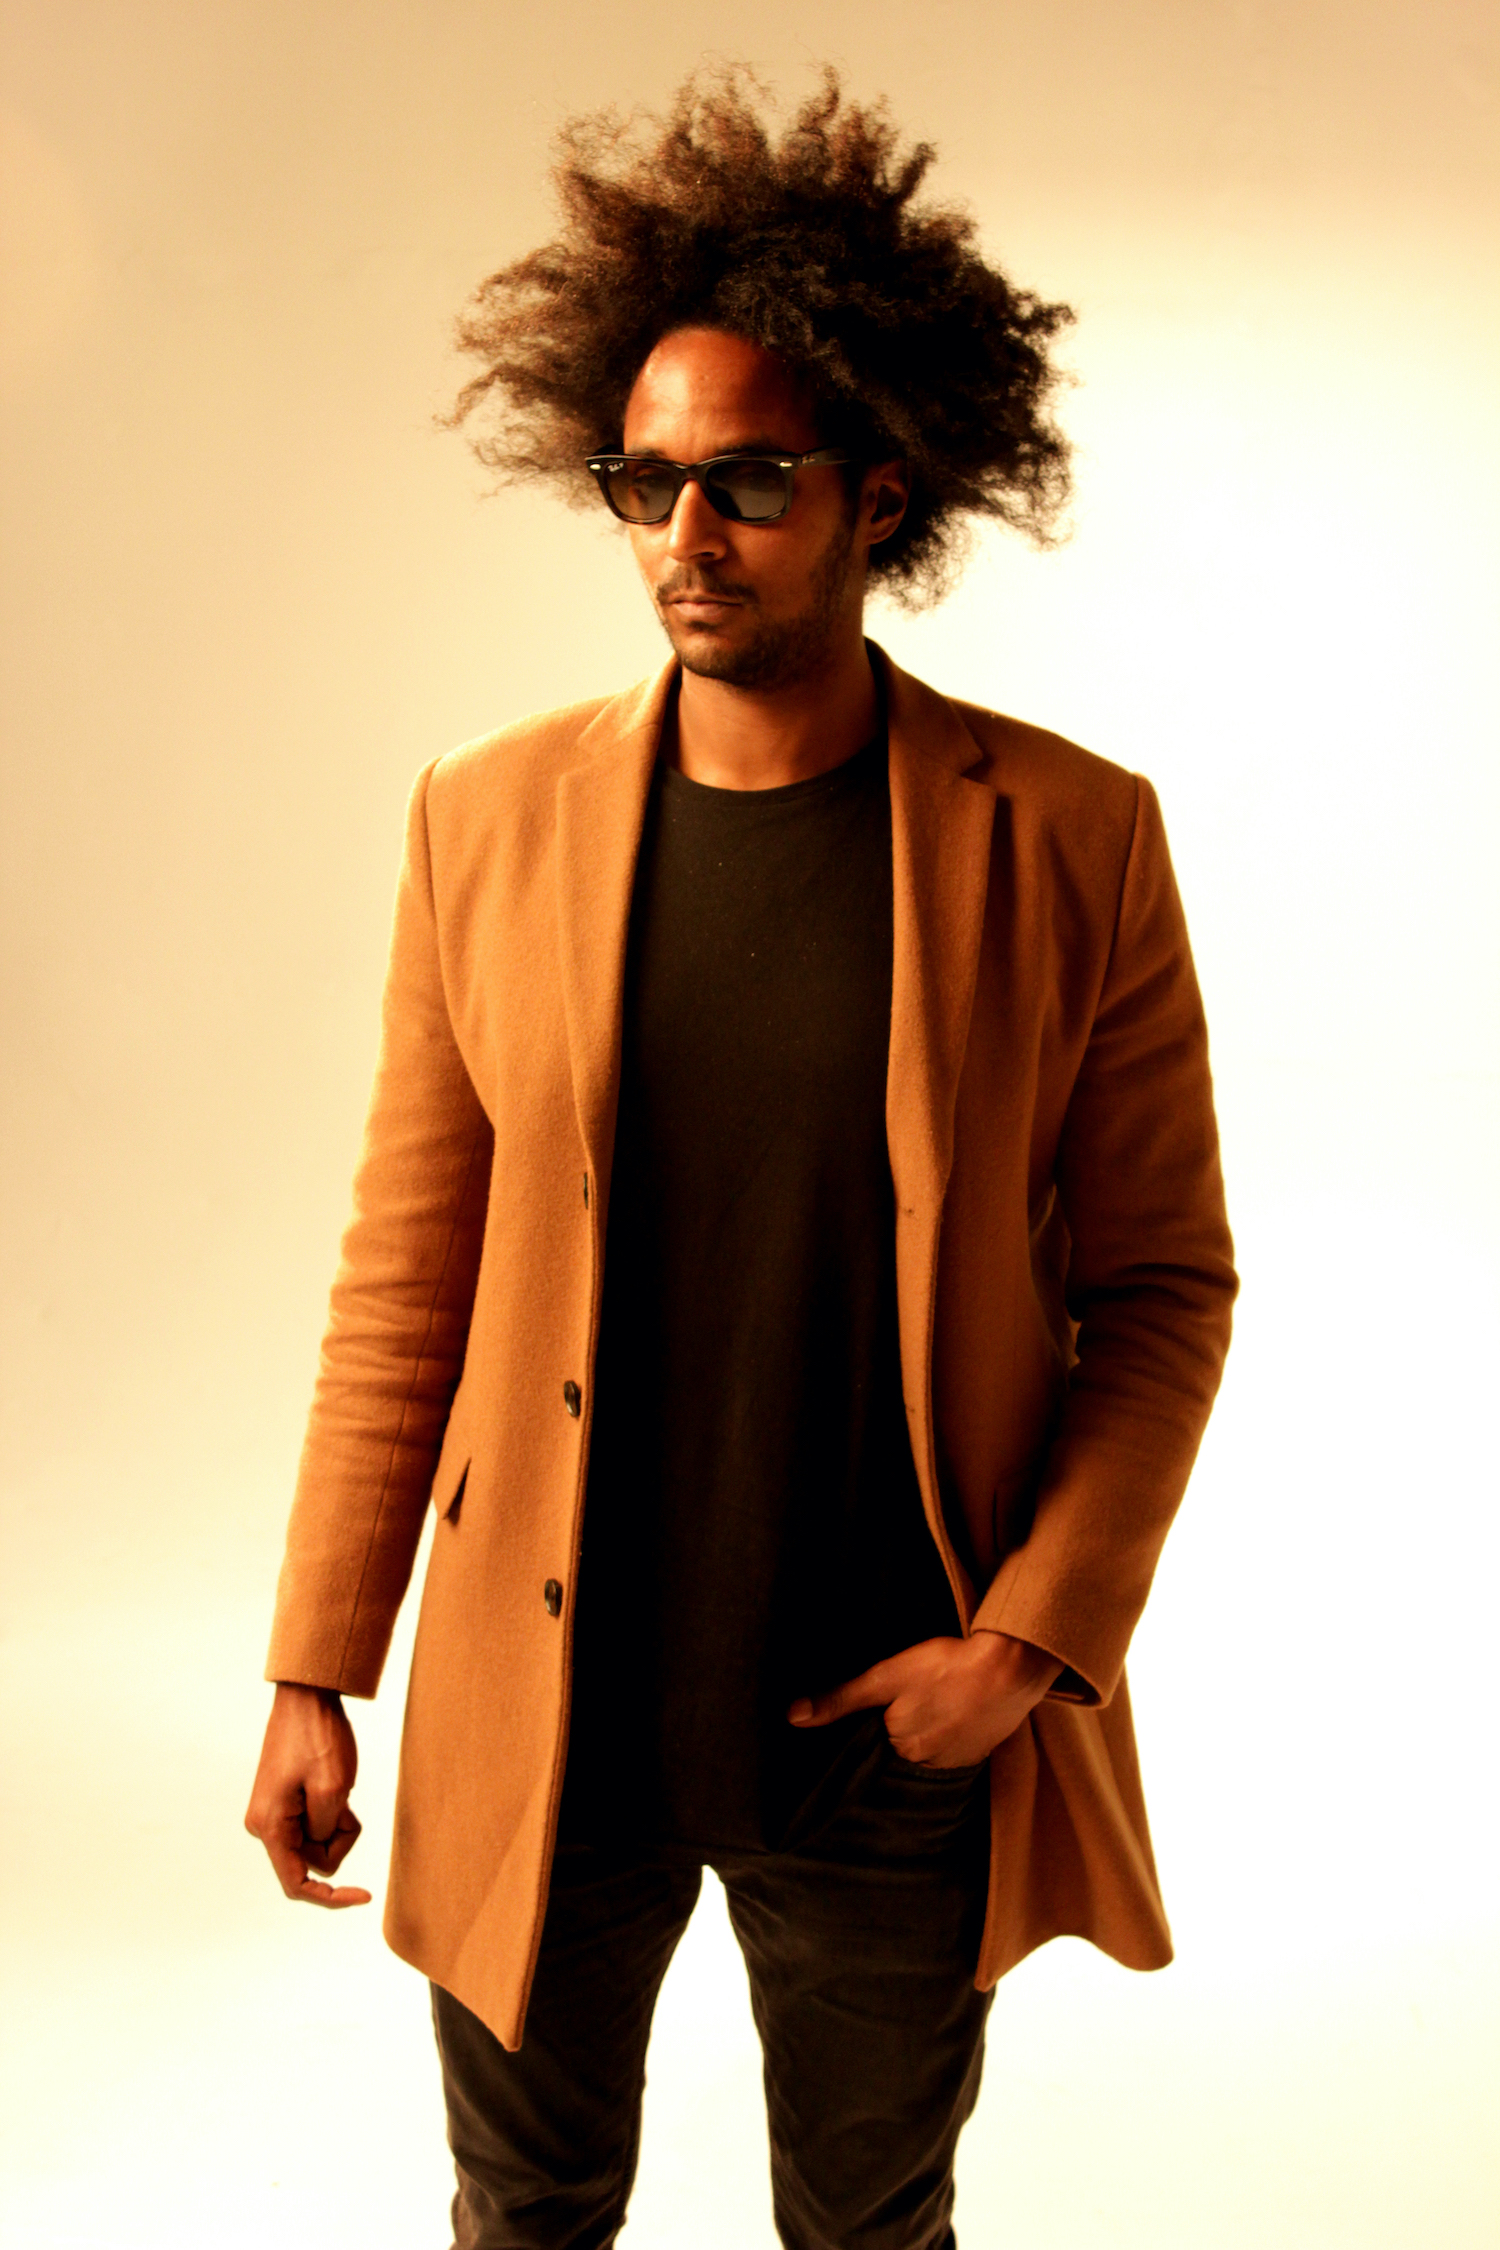 Professional Photography Black Man In Black Shirt Jeans Sunglasses And Orange Blazer Standing On White Studio Backdrop